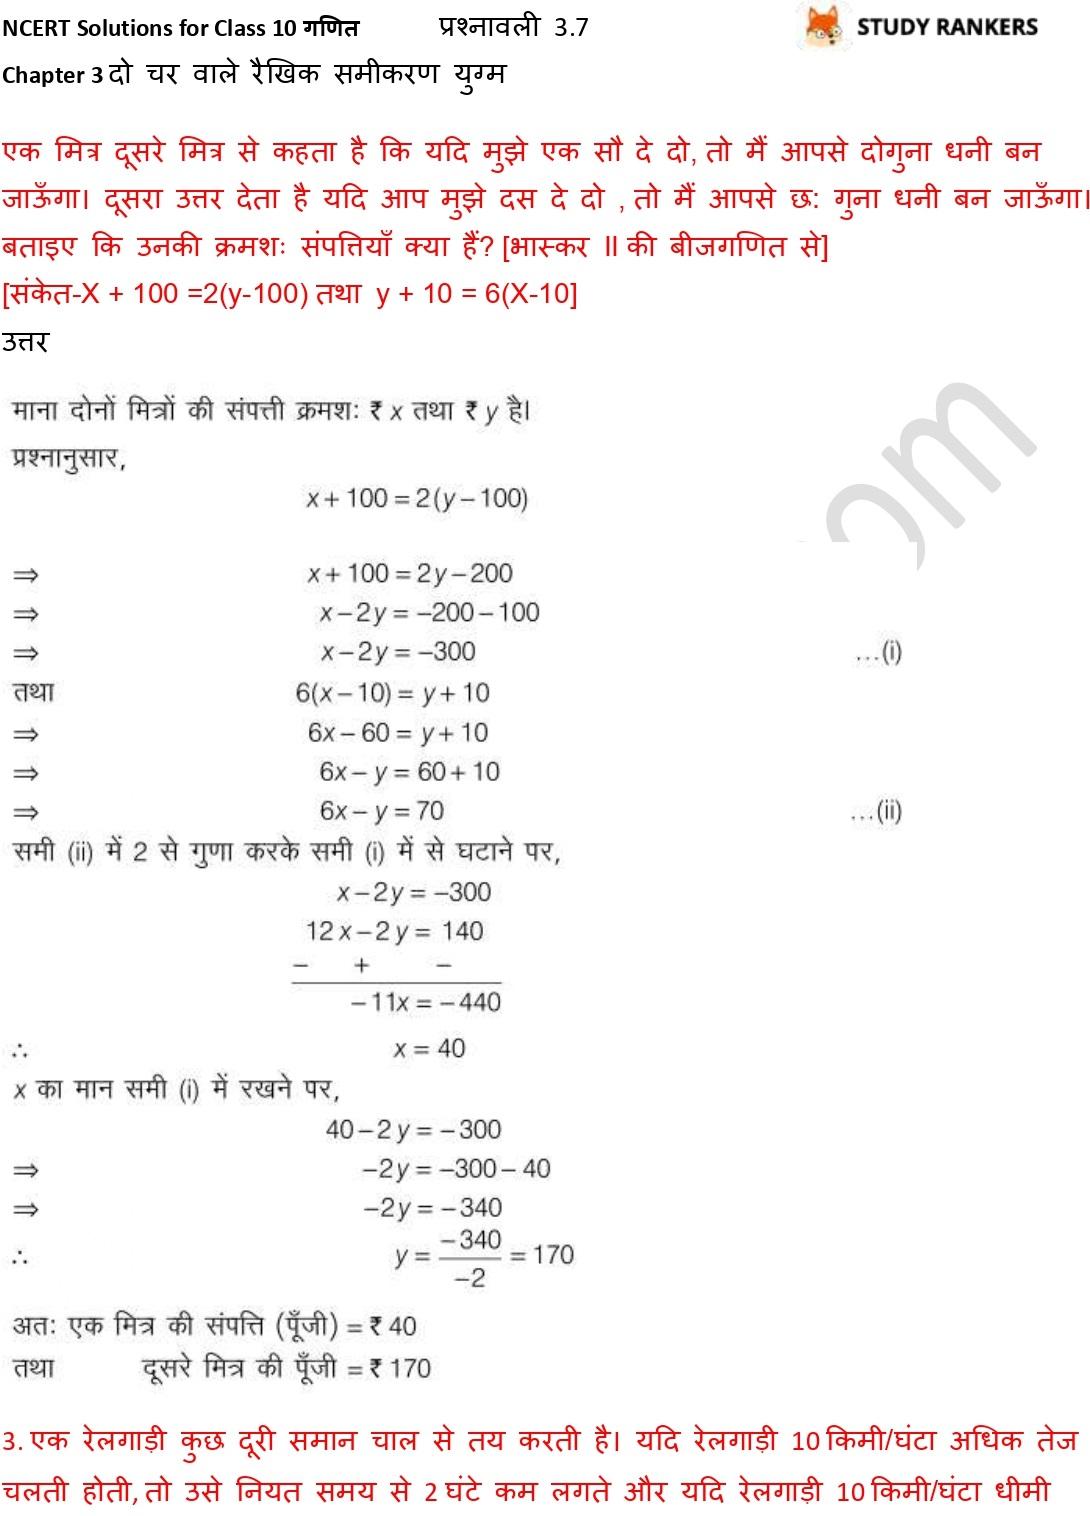 NCERT Solutions for Class 10 Maths Chapter 3 दो चर वाले रैखिक समीकरण युग्म प्रश्नावली 3.7 Part 2